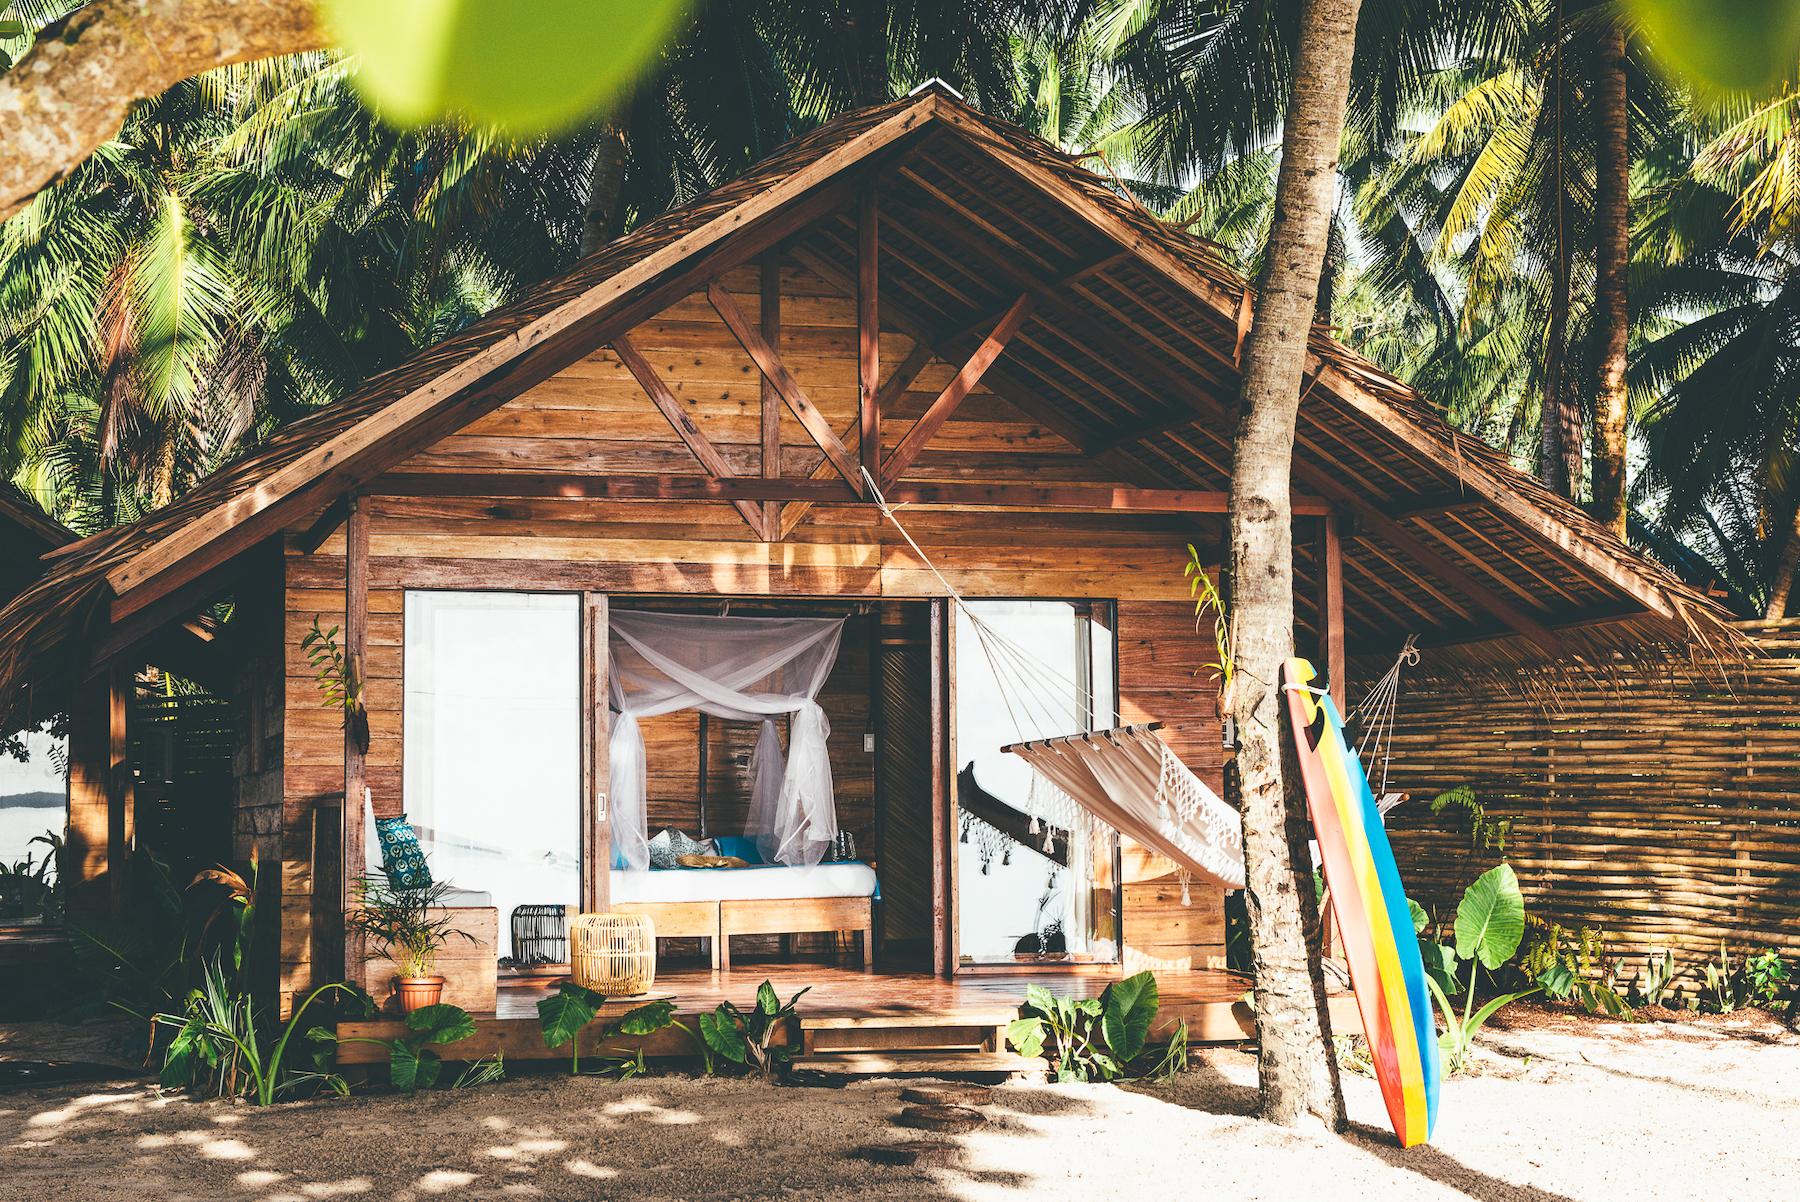 yoga-retreat-siargao-island-philippines-soul-tribe-cabana.jpg